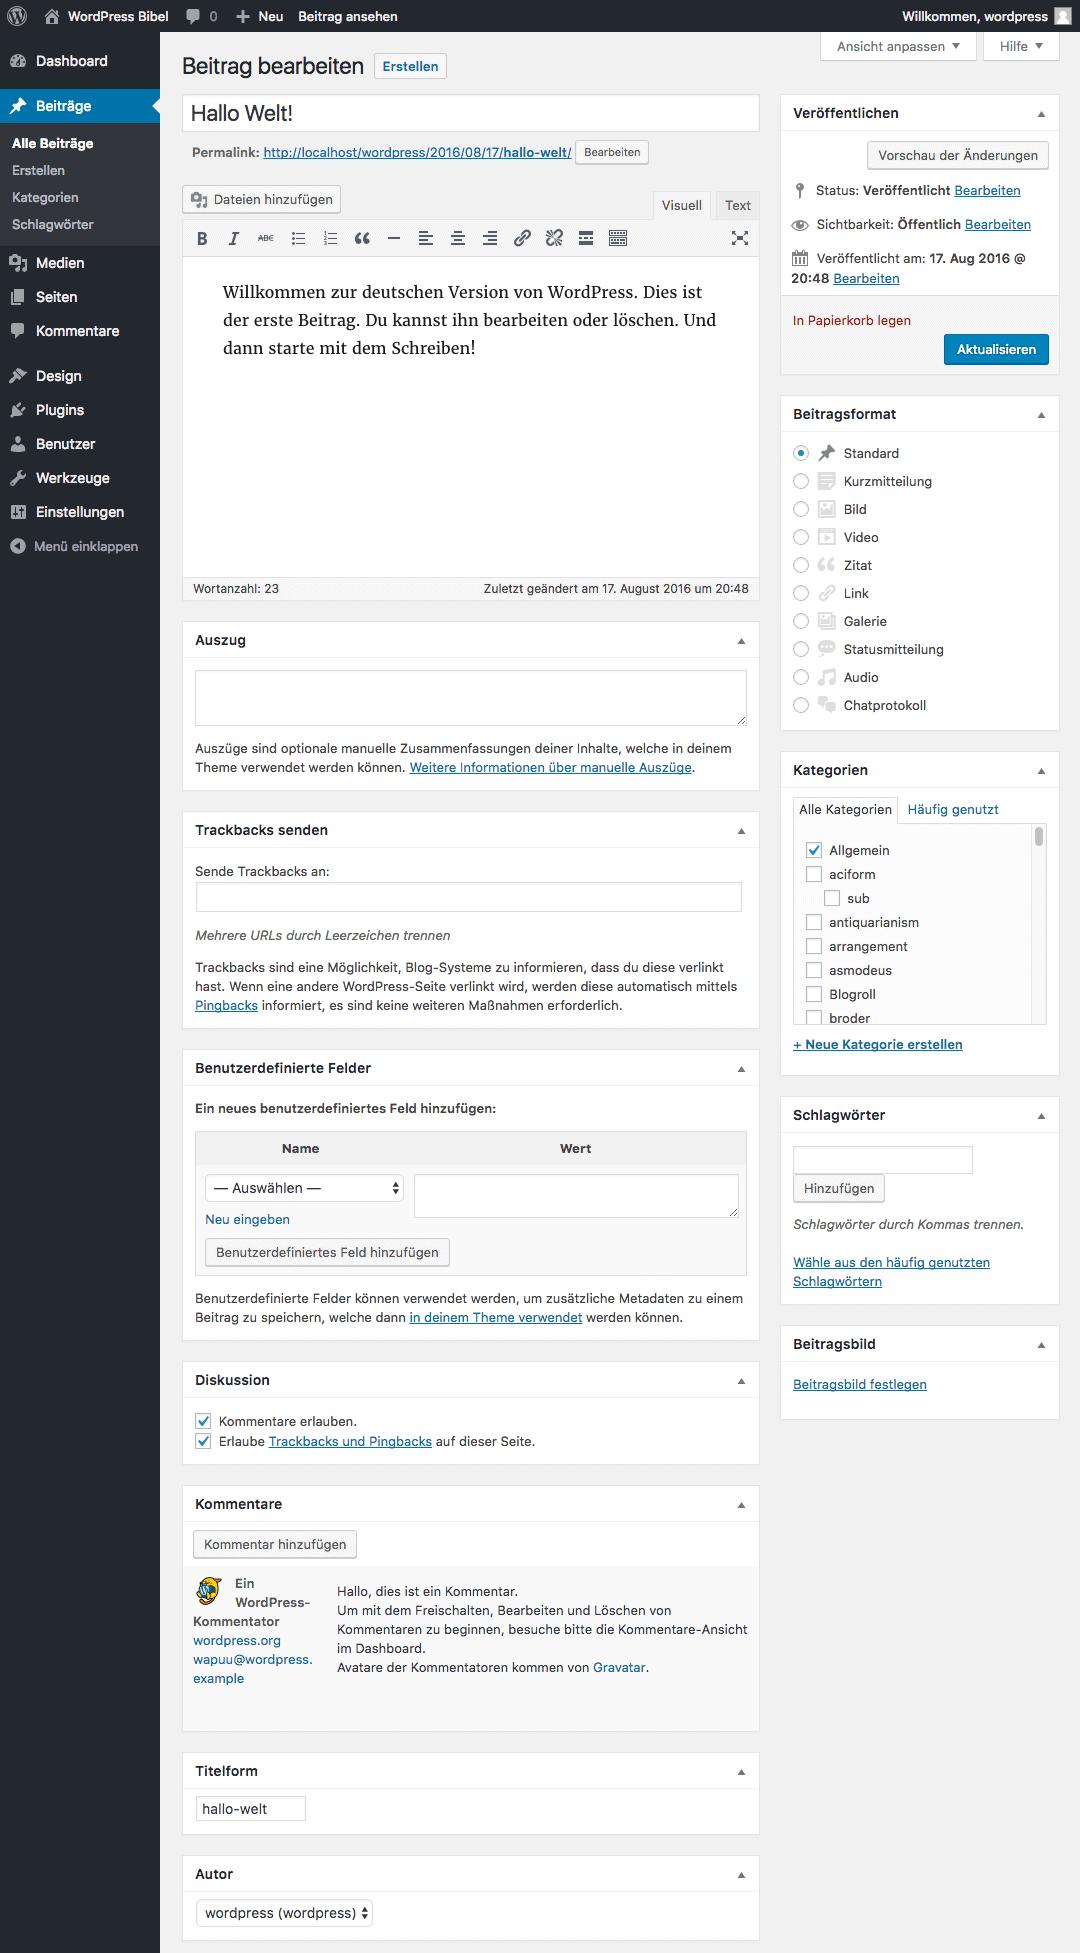 WordPress-Backend → Beiträge → Beitrag bearbeiten